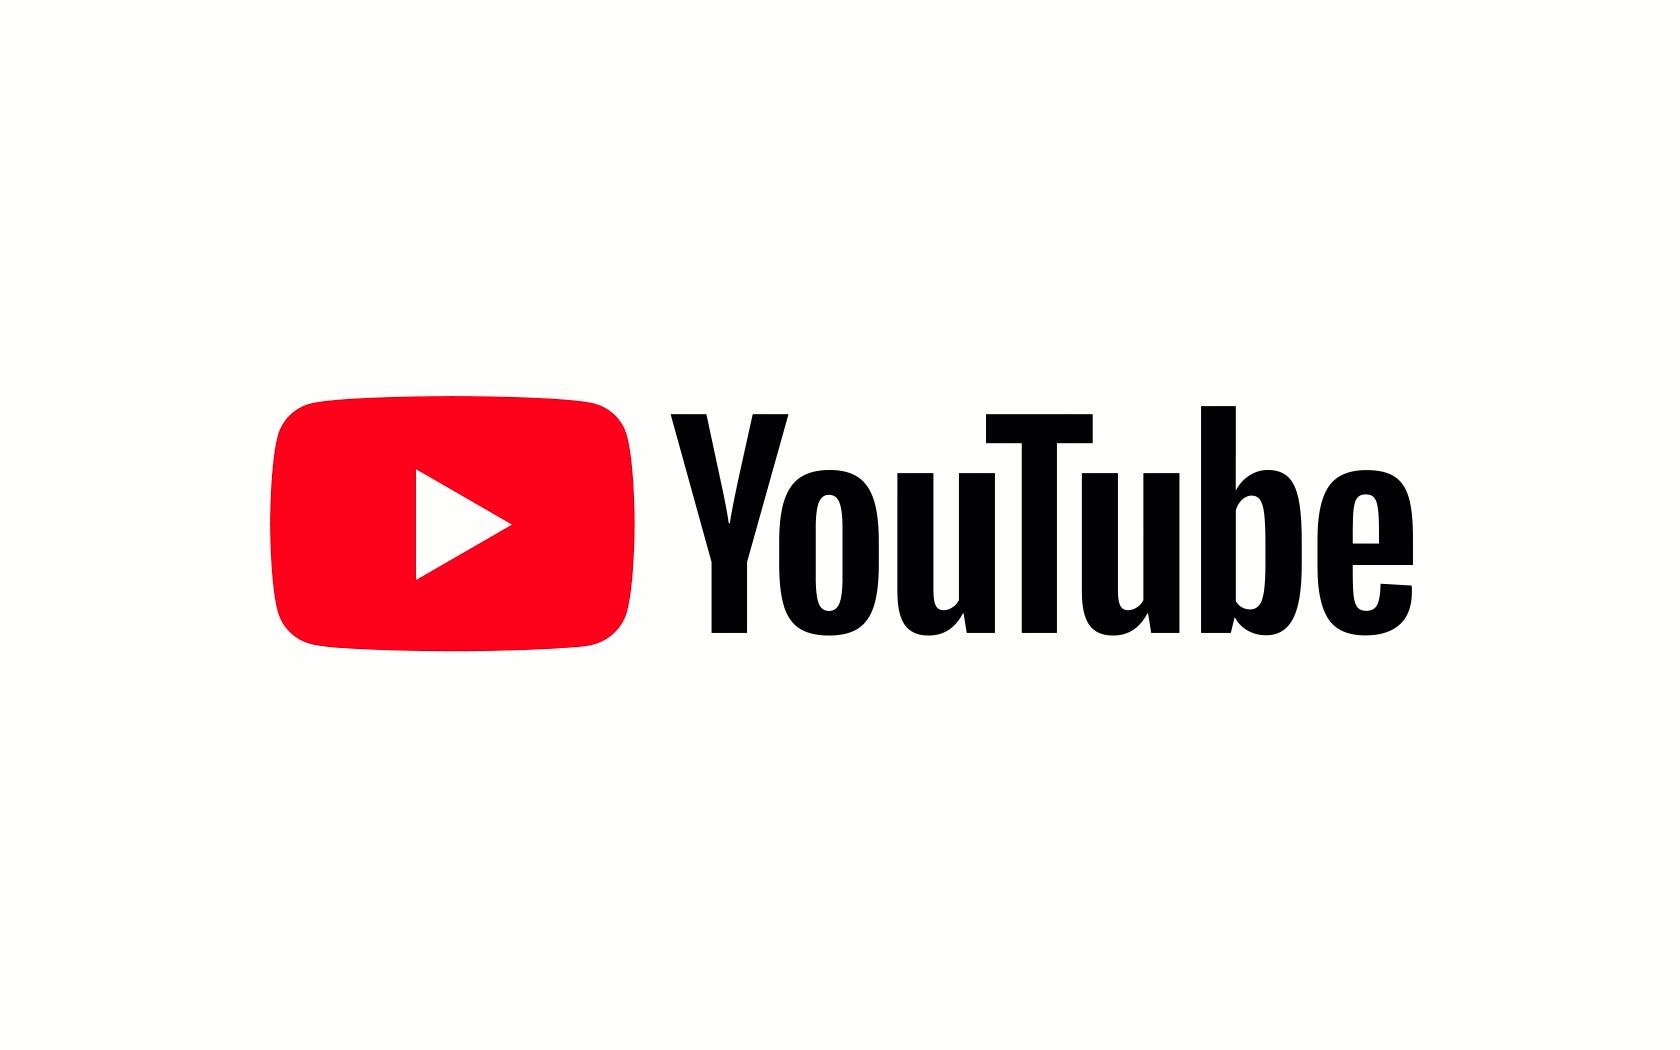 YouTube new